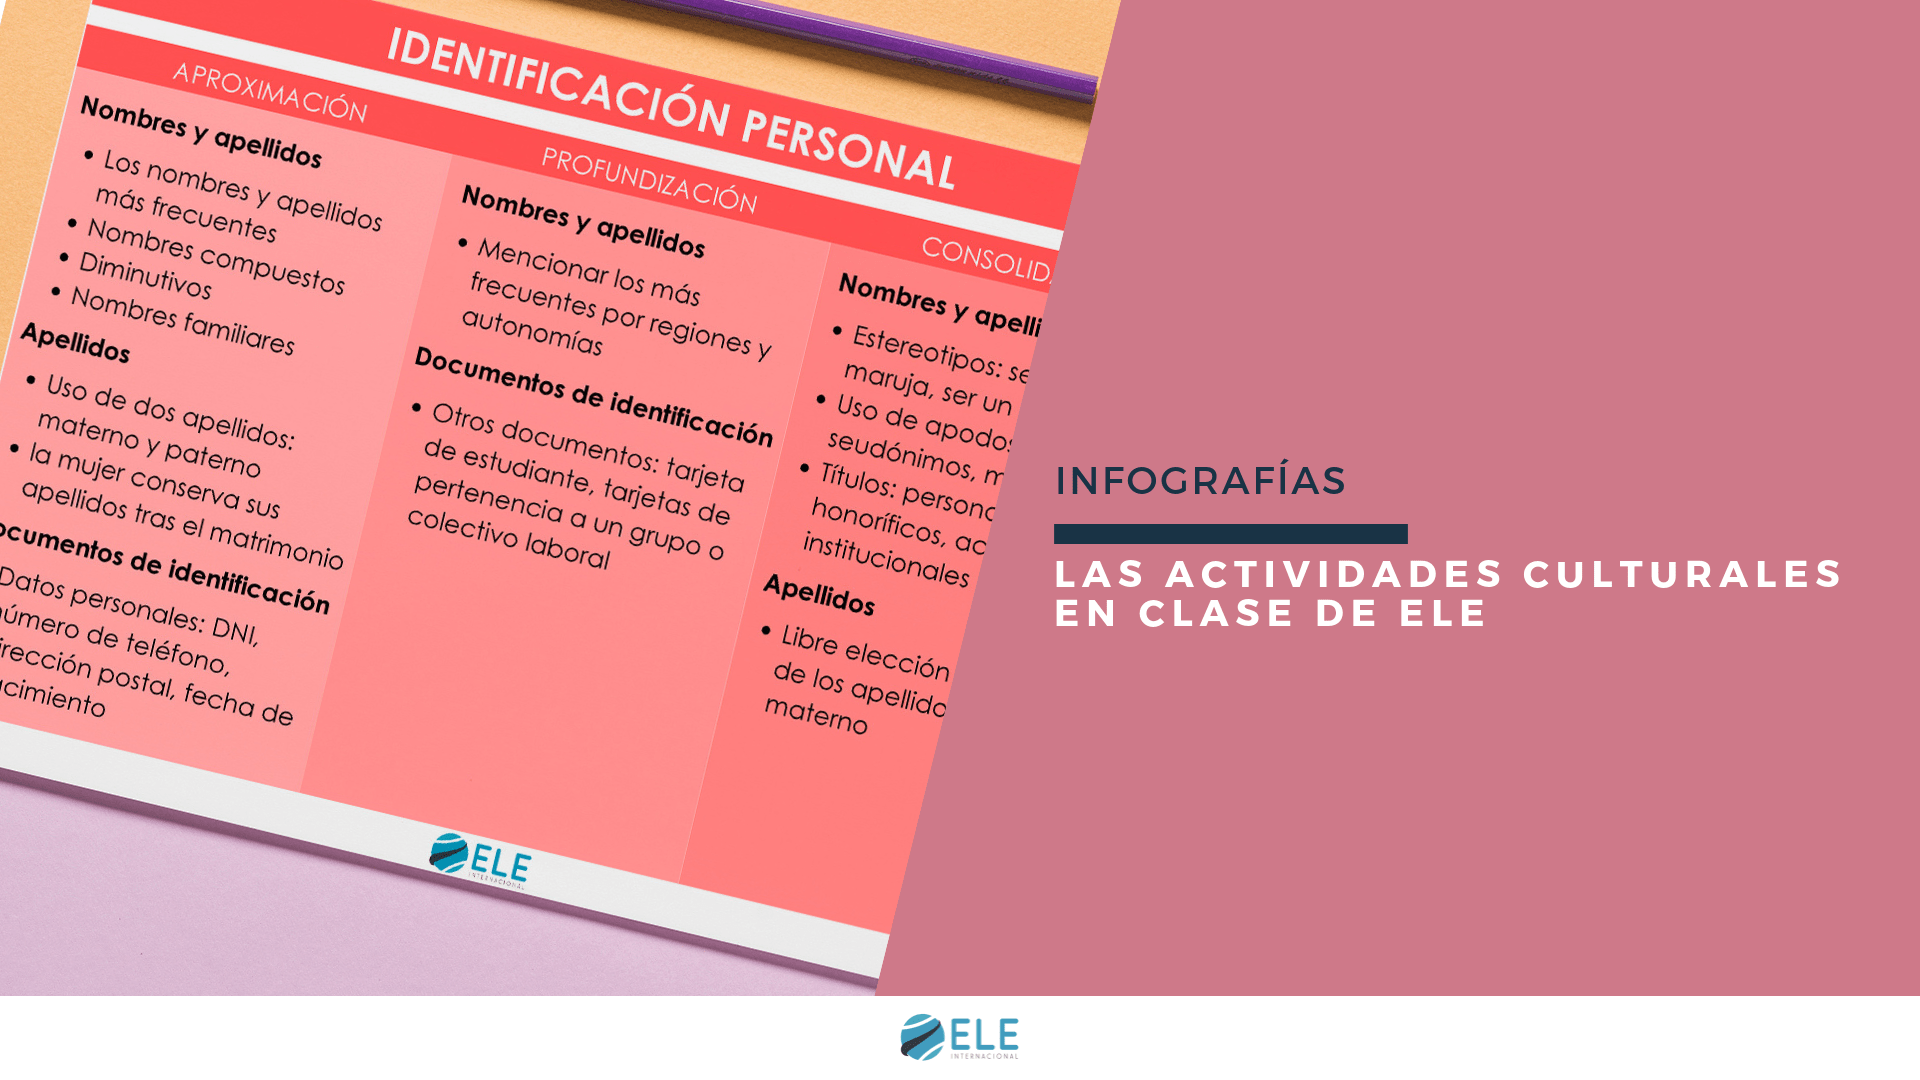 Ideas para trabajar actividades culturales en clase de ELE. #spanishlesson #profedeele #clasedeespañol